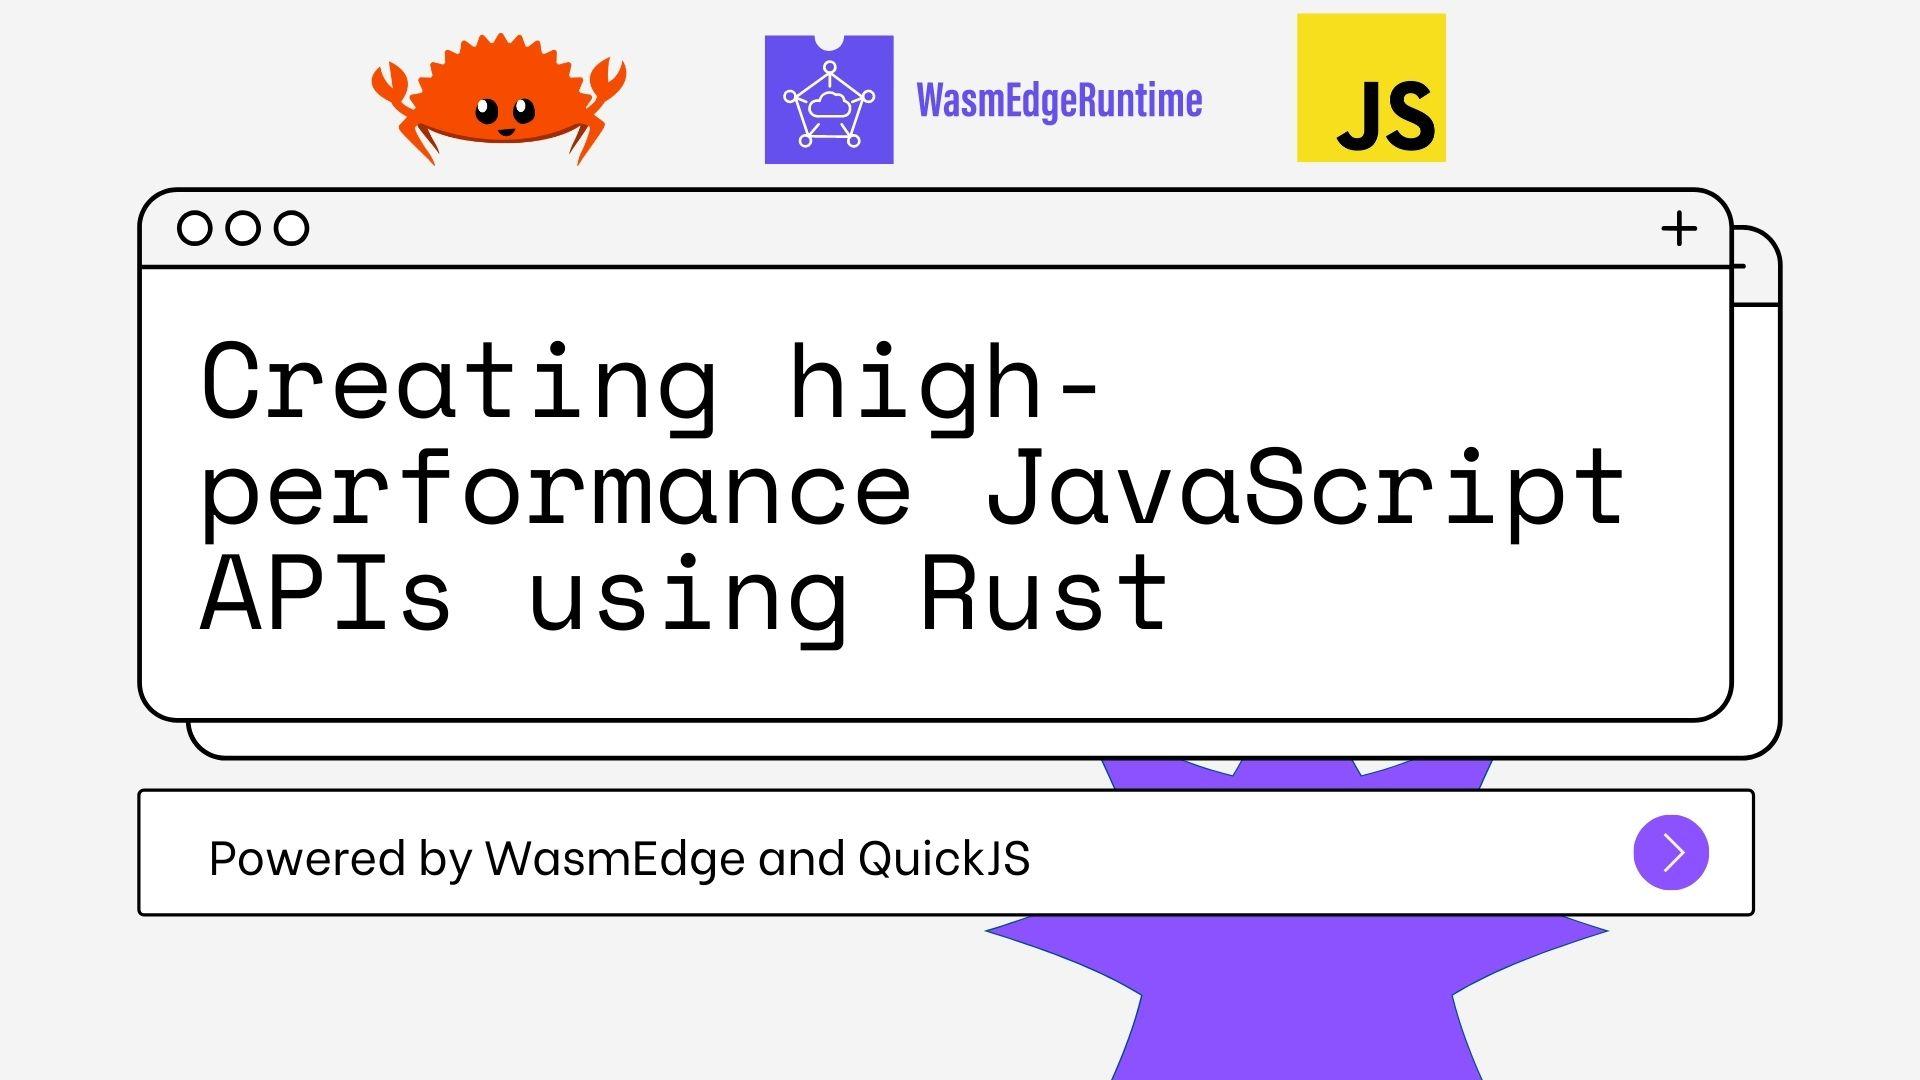 用 Rust 创建高性能 JavaScript API,并在 WebAssembly 中运行(图1)